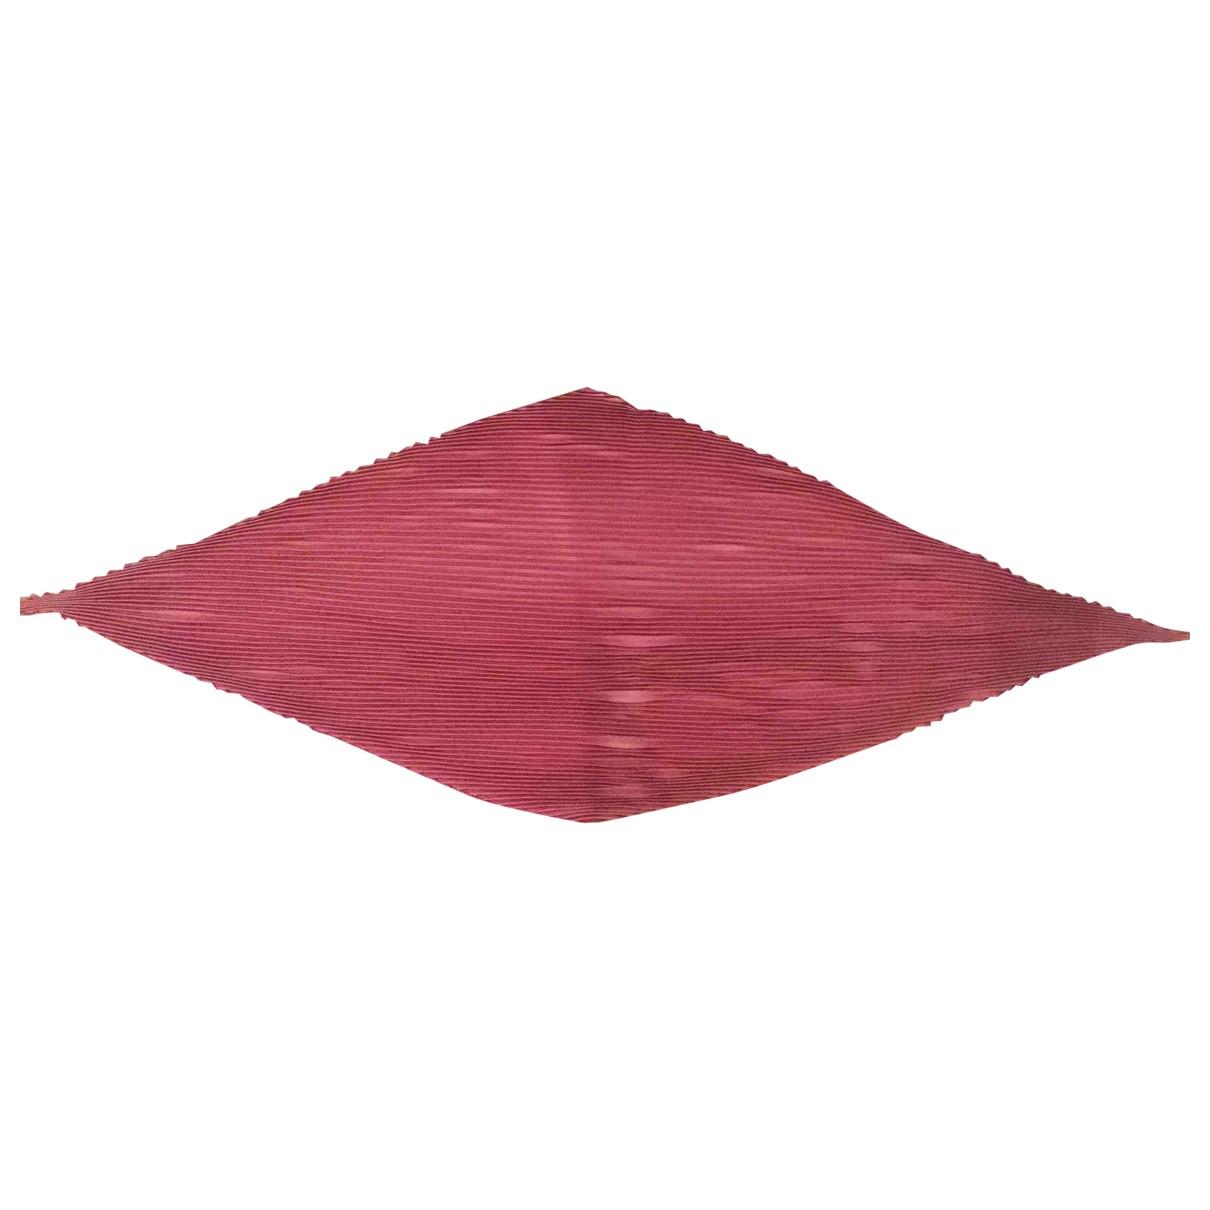 Hermes - Foulard Losange pour femme en soie - rose